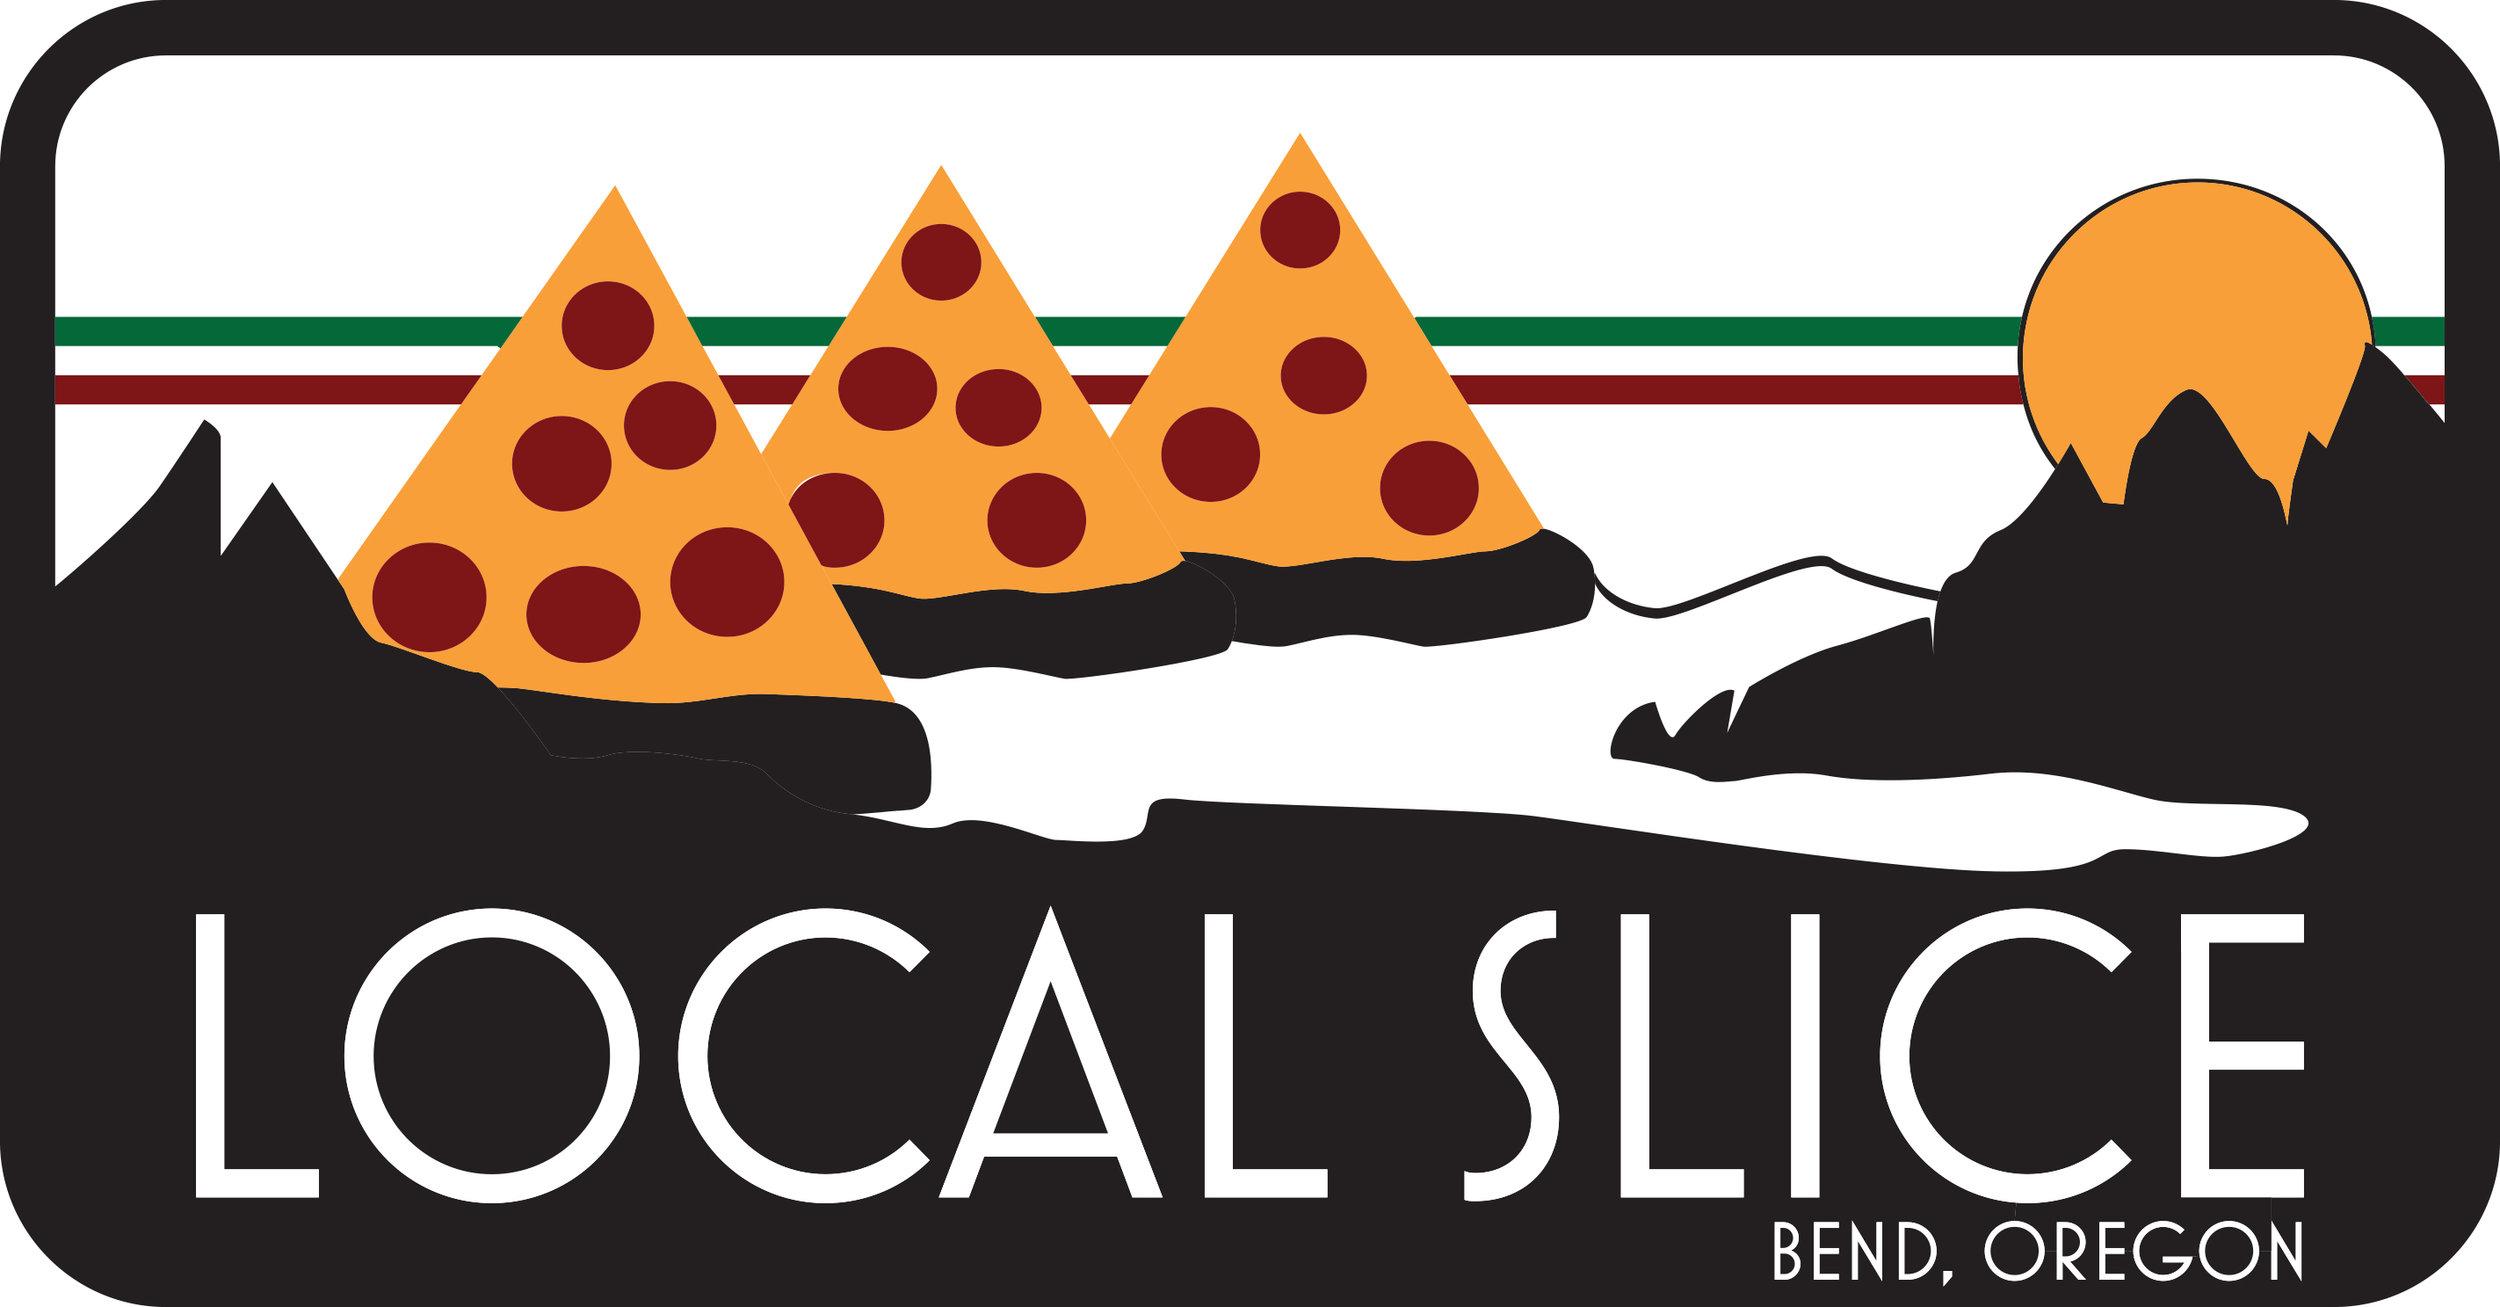 Local Slice_logo.jpg